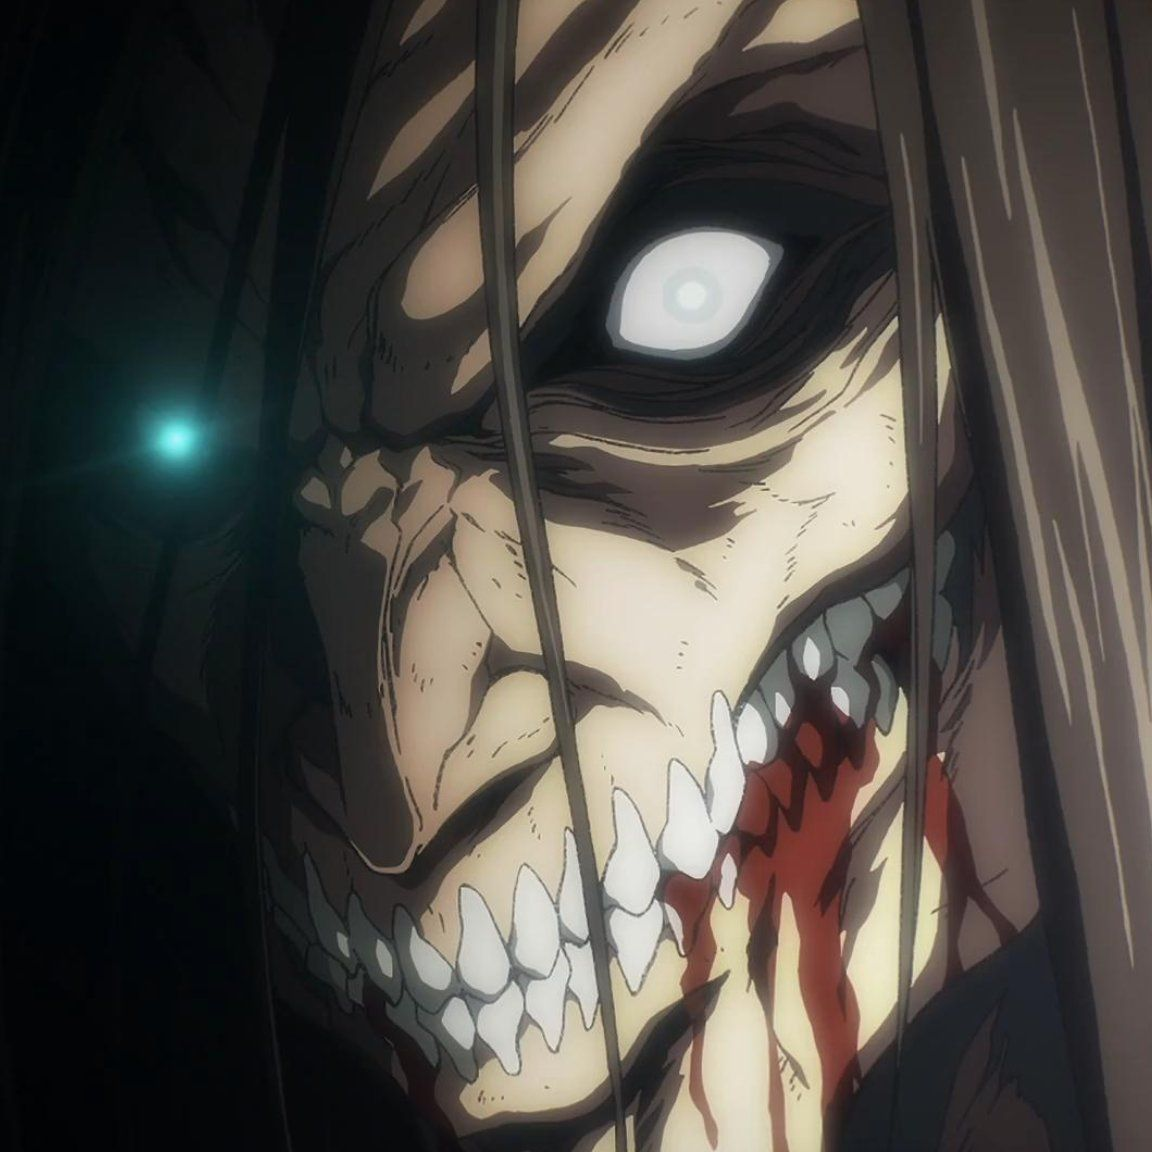 Fandom On Twitter In 2021 Eren Jaeger Attack On Titan Anime